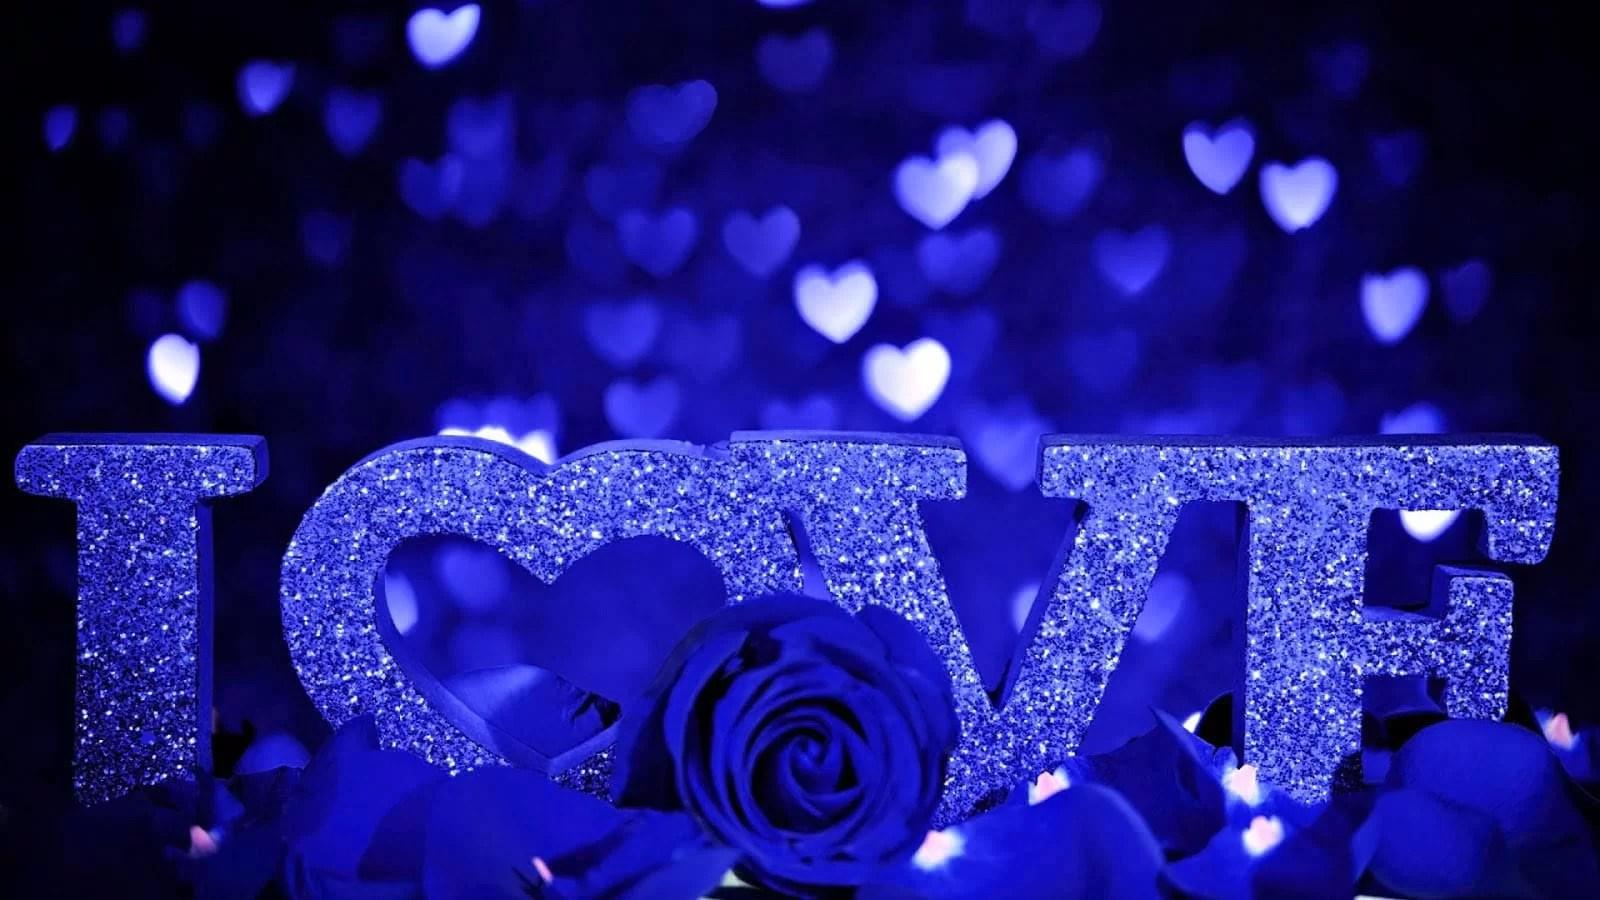 Most Inspiring Wallpaper Love Blue - blue-rose-love  Graphic_738430.jpg?ssl\u003d1